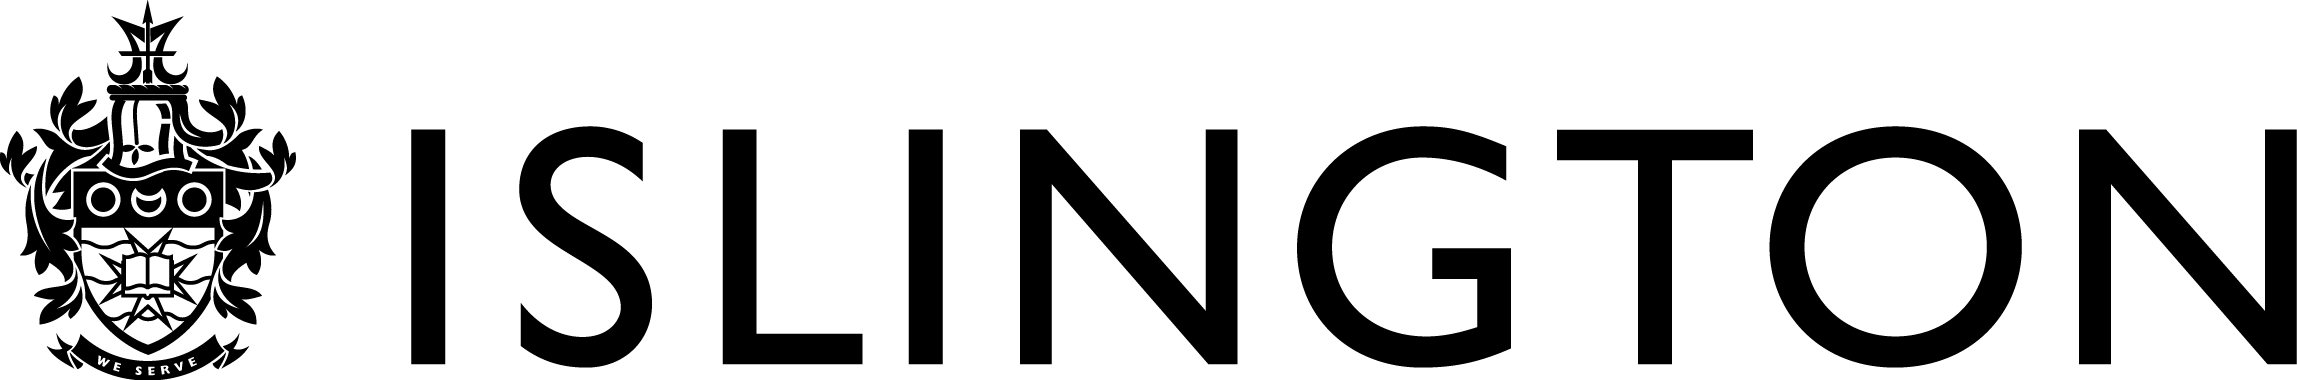 Islington Logo.png